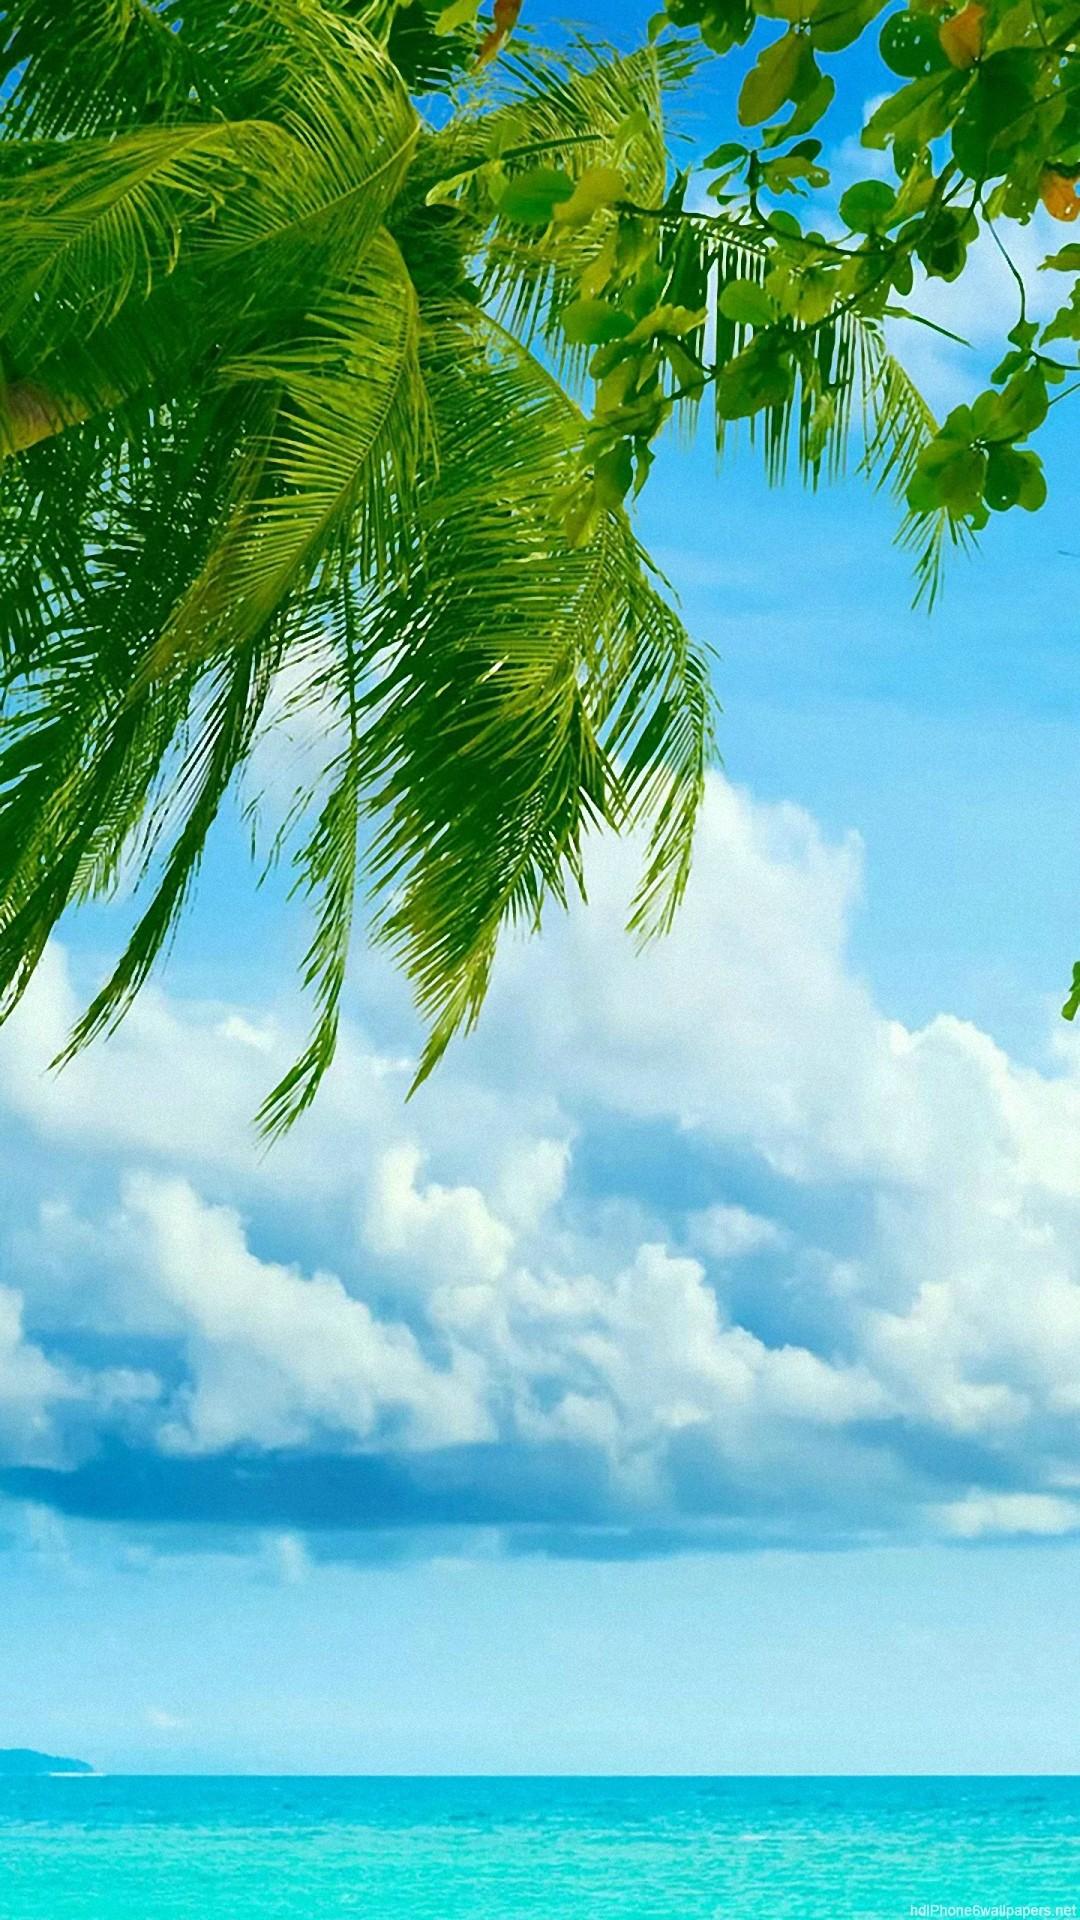 HD sea tree beach clouds tropical iphone 6 wallpaper